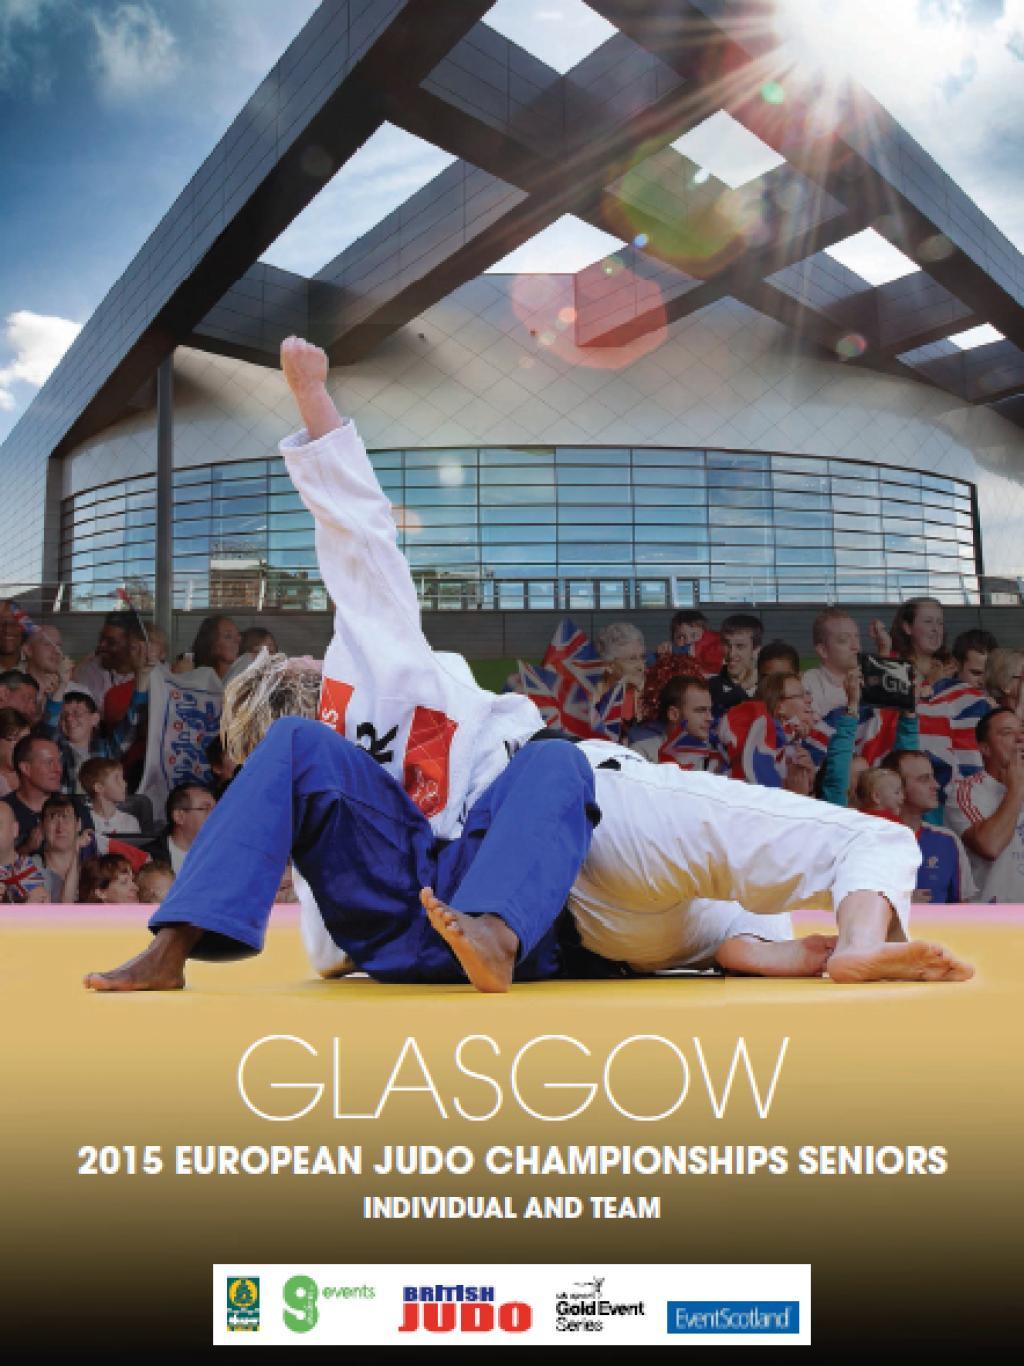 Glasgow to host 2015 European Judo Championships